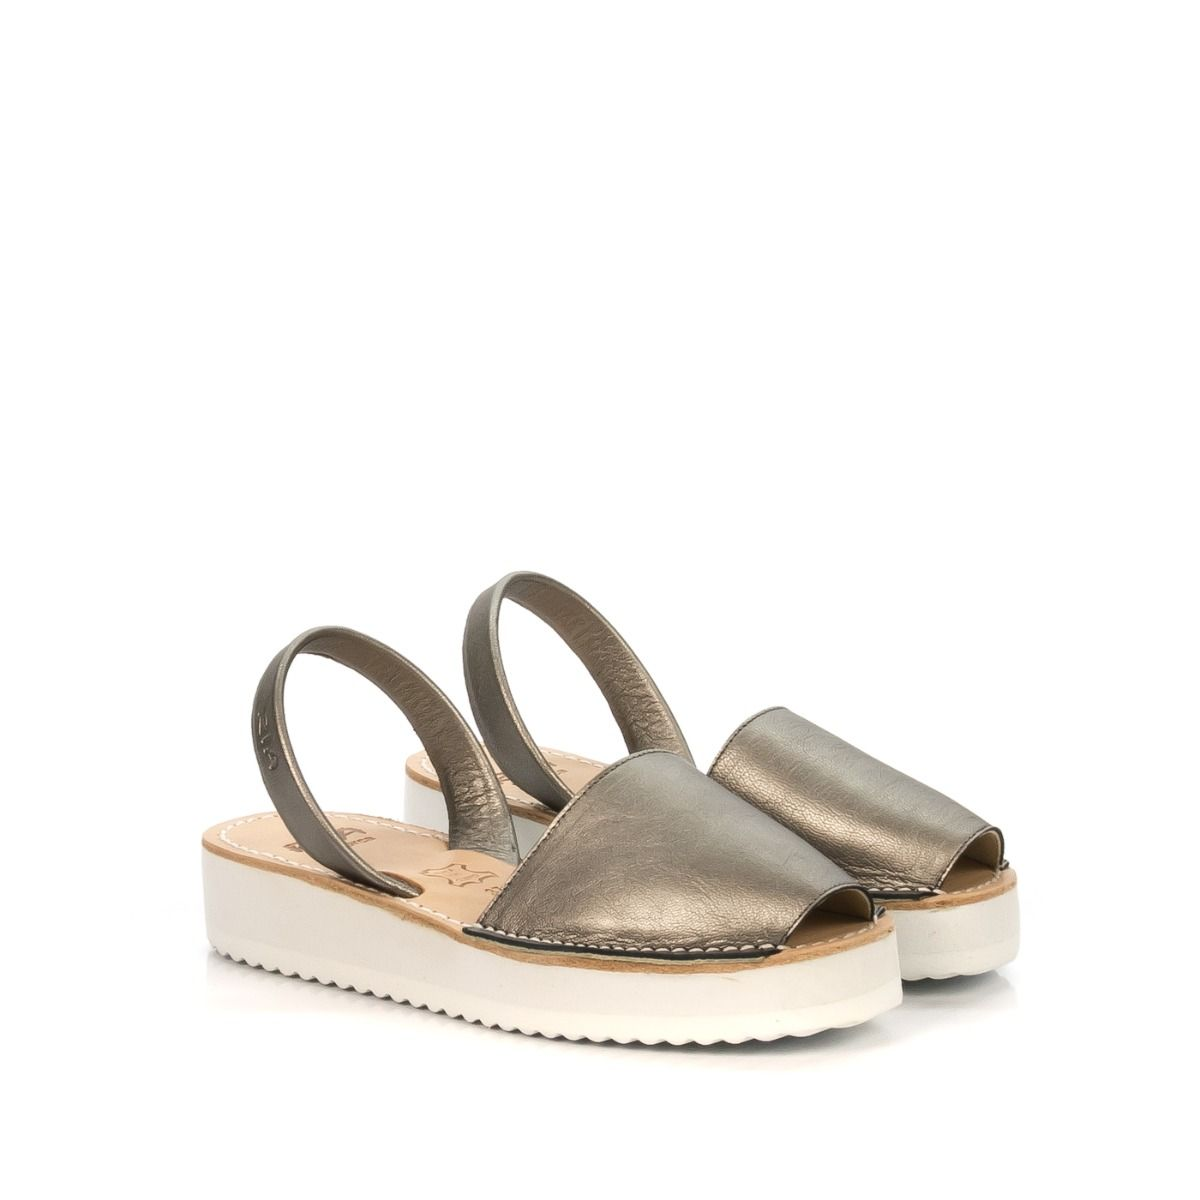 Sandalo donna RIA MENORCA 27300 con platform pelle acciaio laminato ... fecd69c8fb2